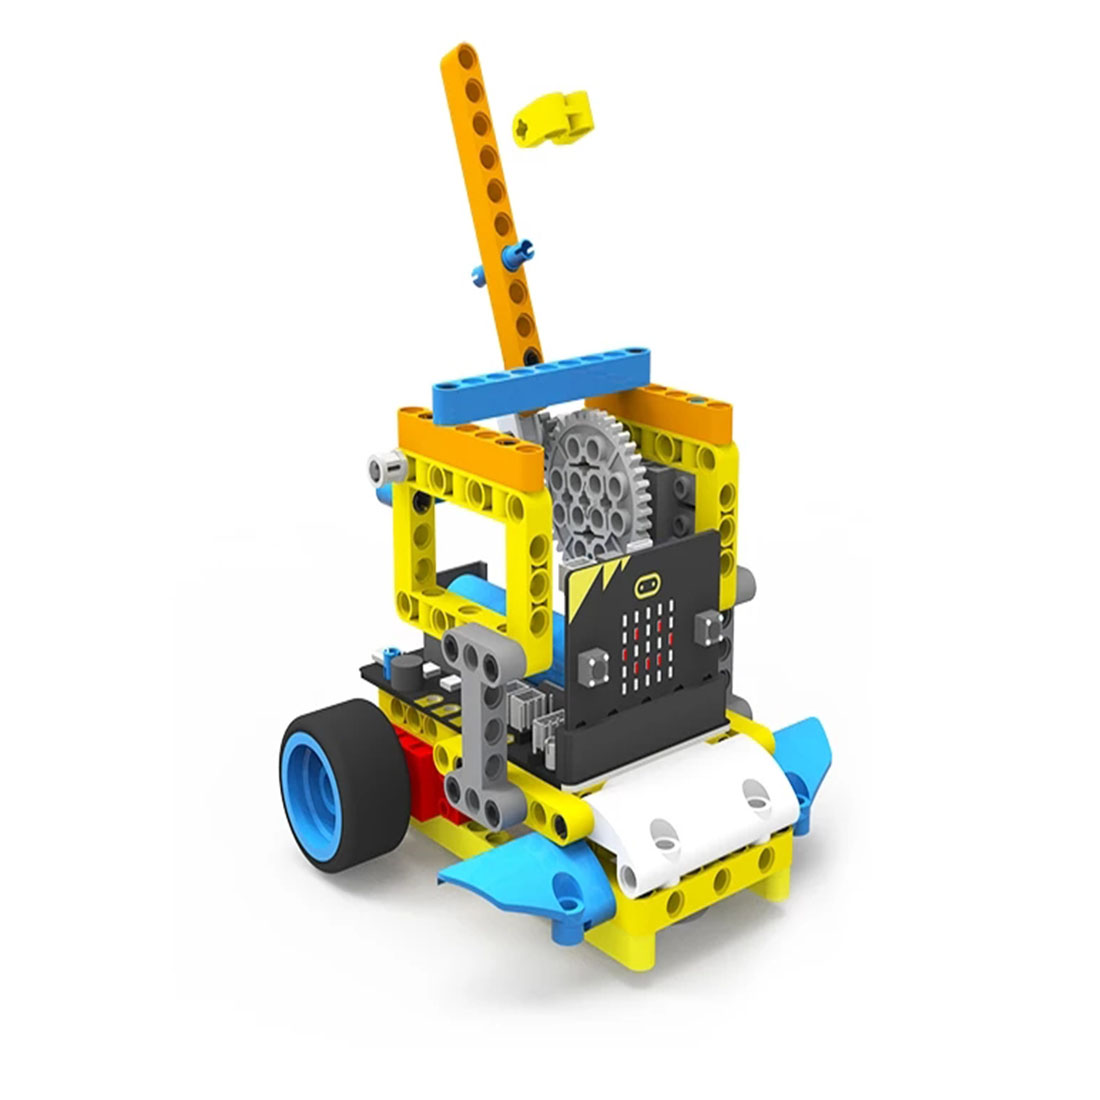 Program Intelligent Robot Building Block Car Kit Various Shapes Steam Education Car For Micro:bit(Not Including Micro:bit Board)